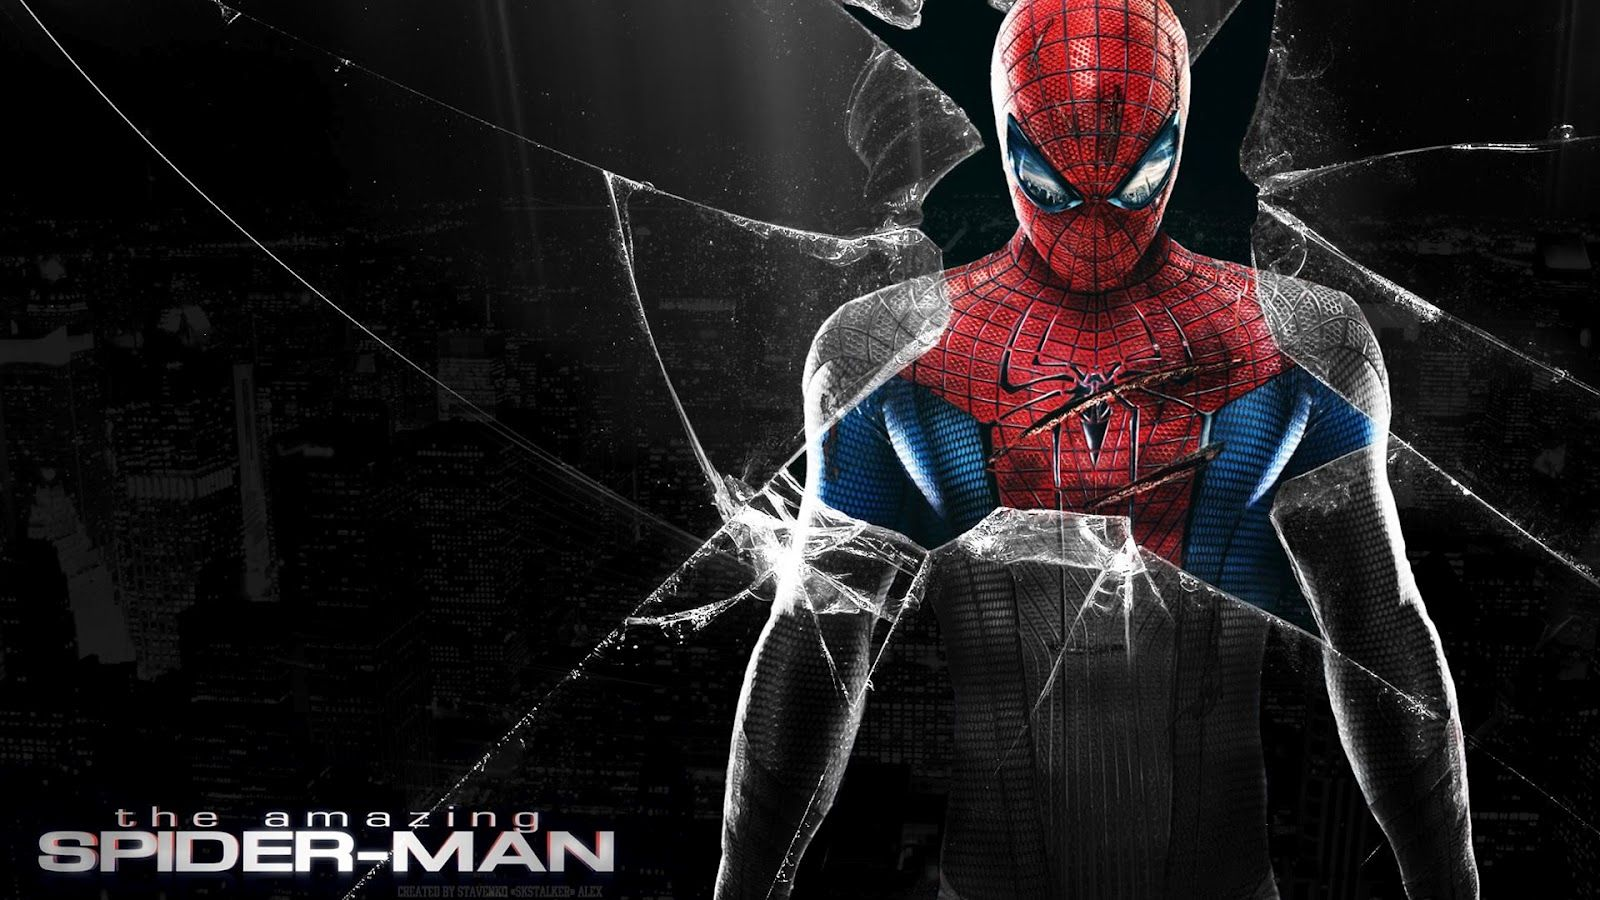 Spiderman Wallpaper For Desktop 1600x900 HD Wallpapers Of 4 52